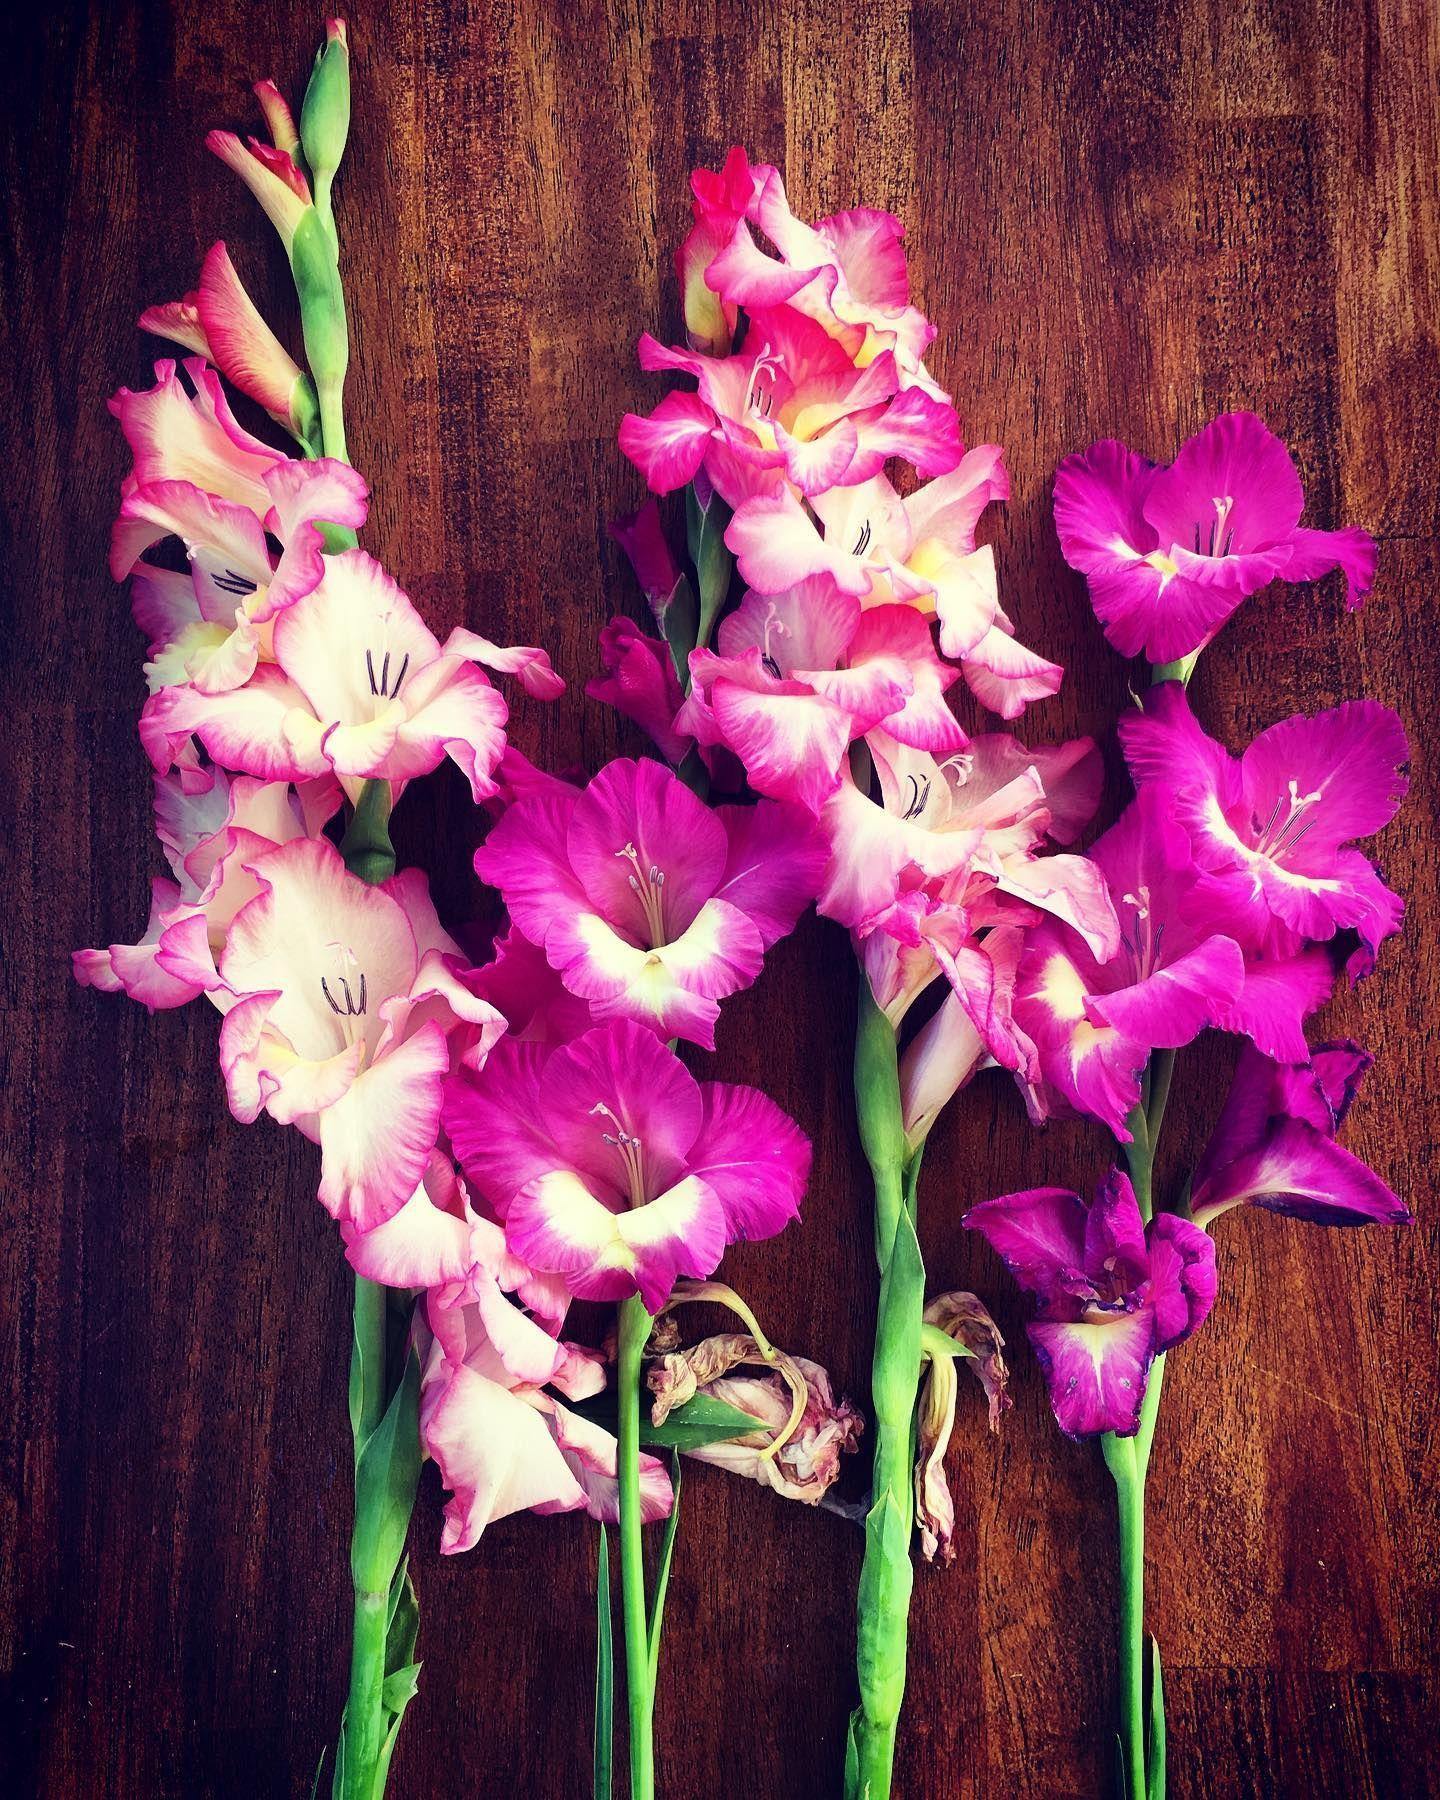 #botanicaldreamers #theslowdowncollective #floralinspiration #flowerlover -  #botanicaldreamers #theslowdowncollective #floralinspiration #flowerlover   - #botanicaldreamers #Clematis #Daffodils #EnglishRoses #floralinspiration #flowerlover #Gladioli #Irises #theslowdowncollective #Tulipi